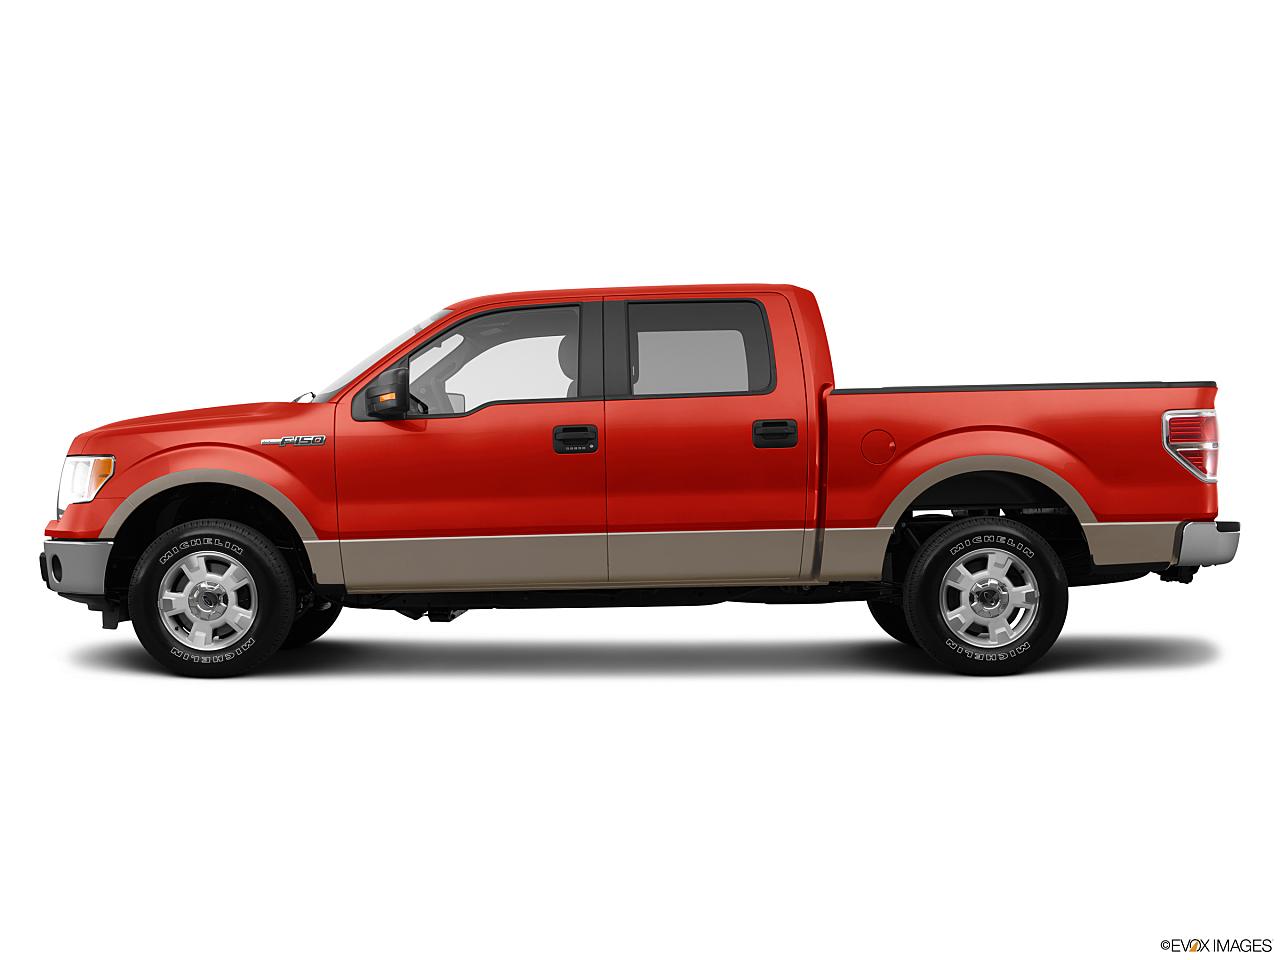 2014 ford f 150 at tri county gm of la junta co for Tri county motors inventory